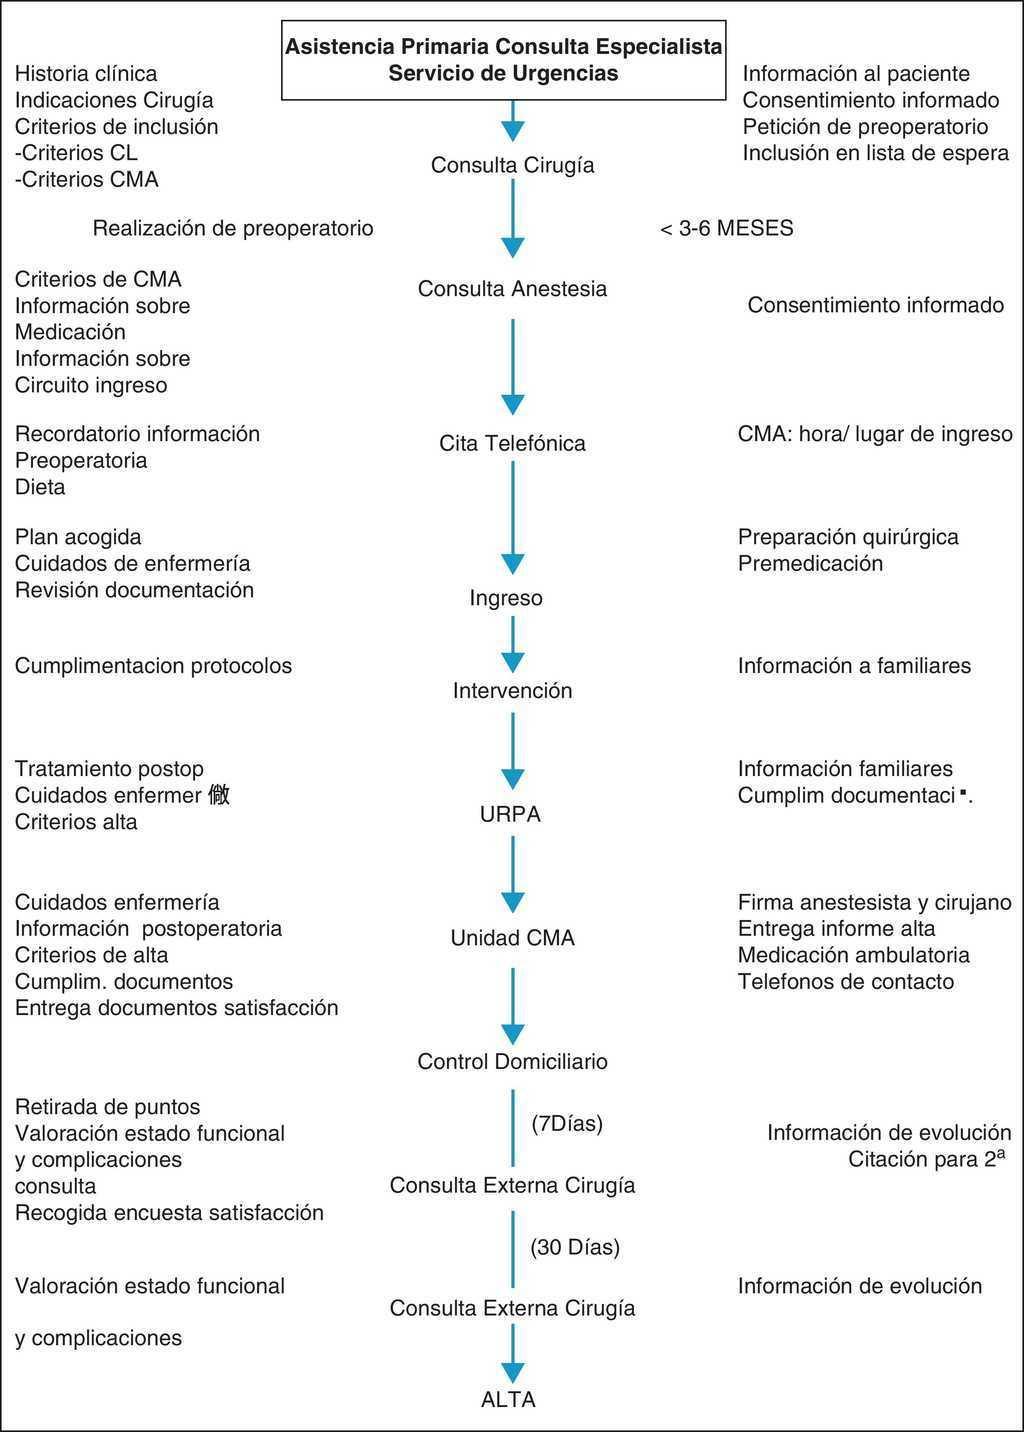 Colecistectomía laparoscópica ambulatoria versus con ingreso ...